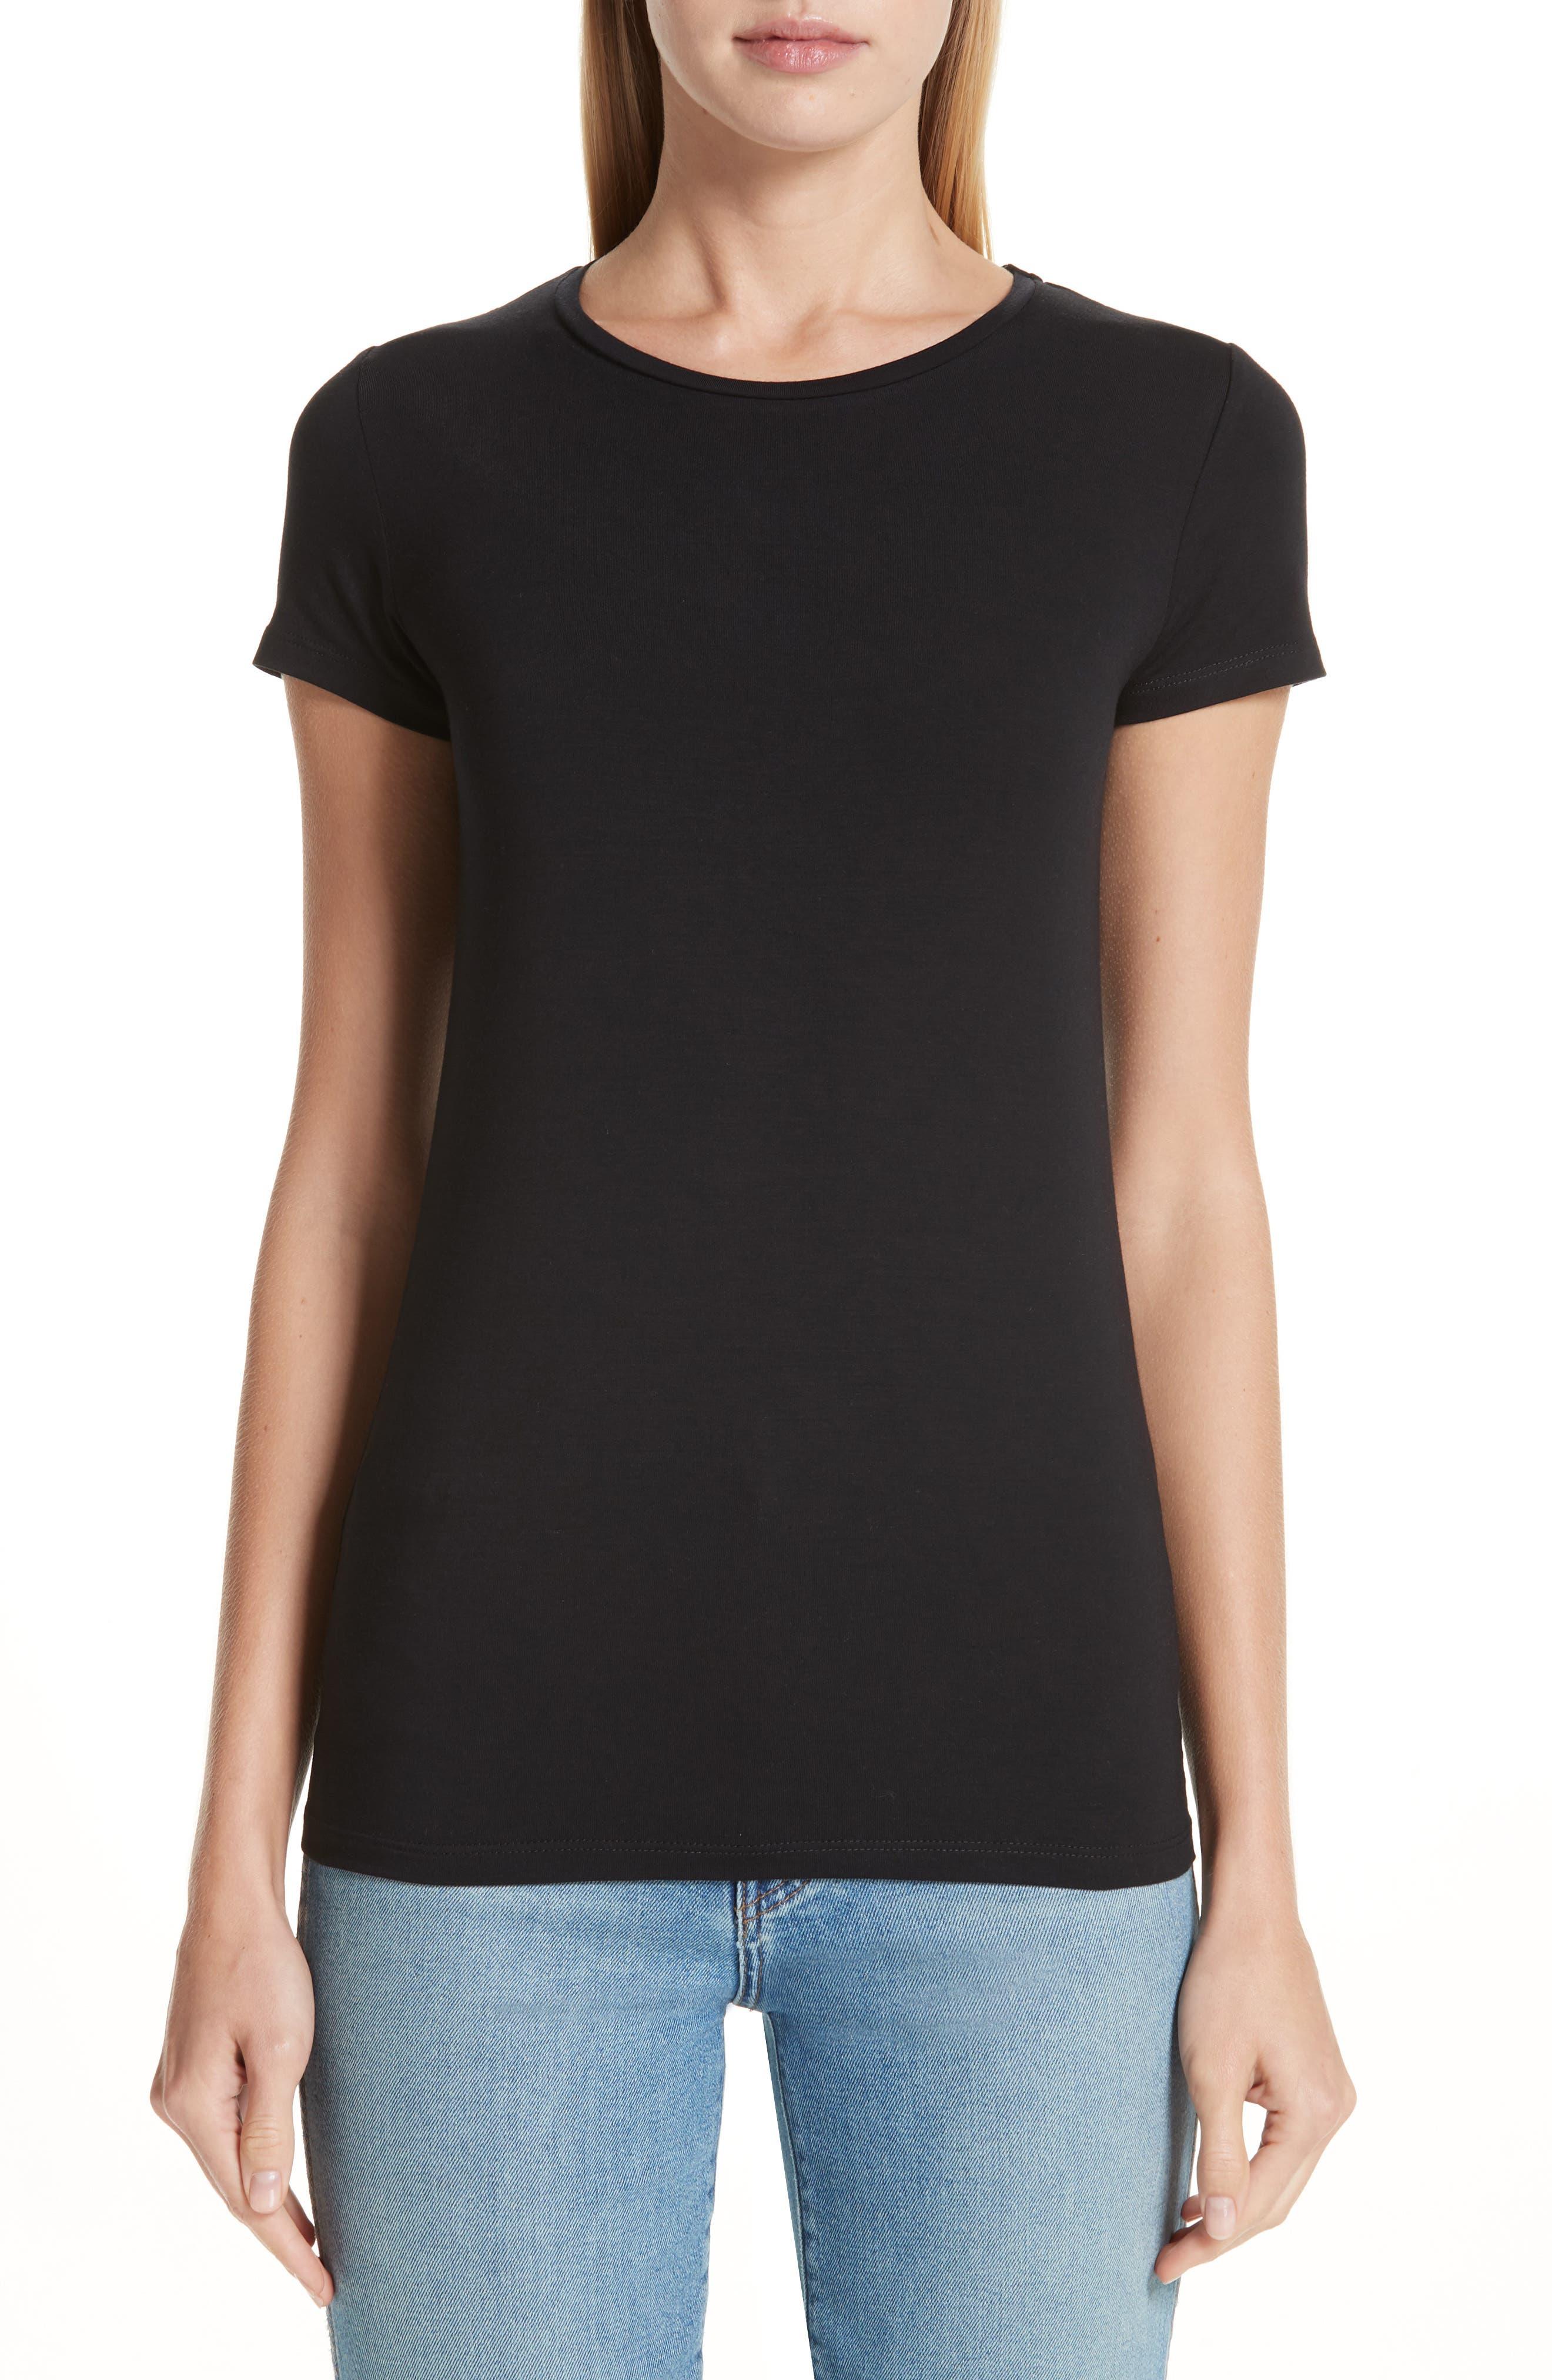 MAJESTIC Soft Touch Short-Sleeve Crewneck T-Shirt in Noir